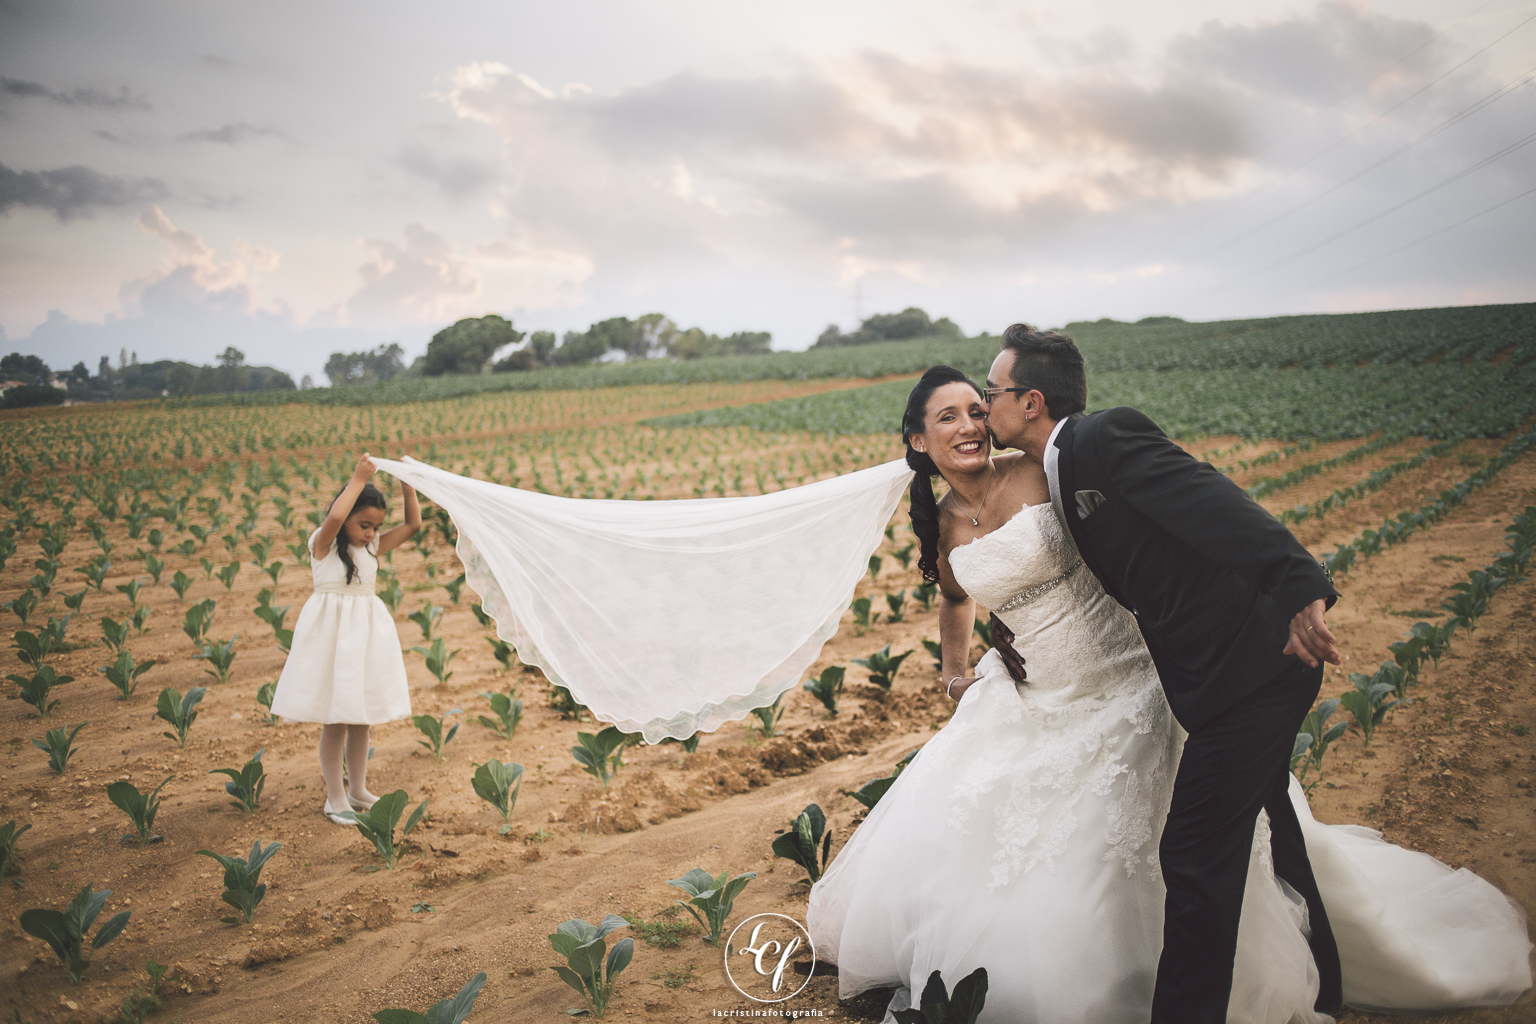 fotografia de bodas barcelona ::: fotógrafo de bodas :: Espai Can pages :: bodas en el campo :: bodas en masía